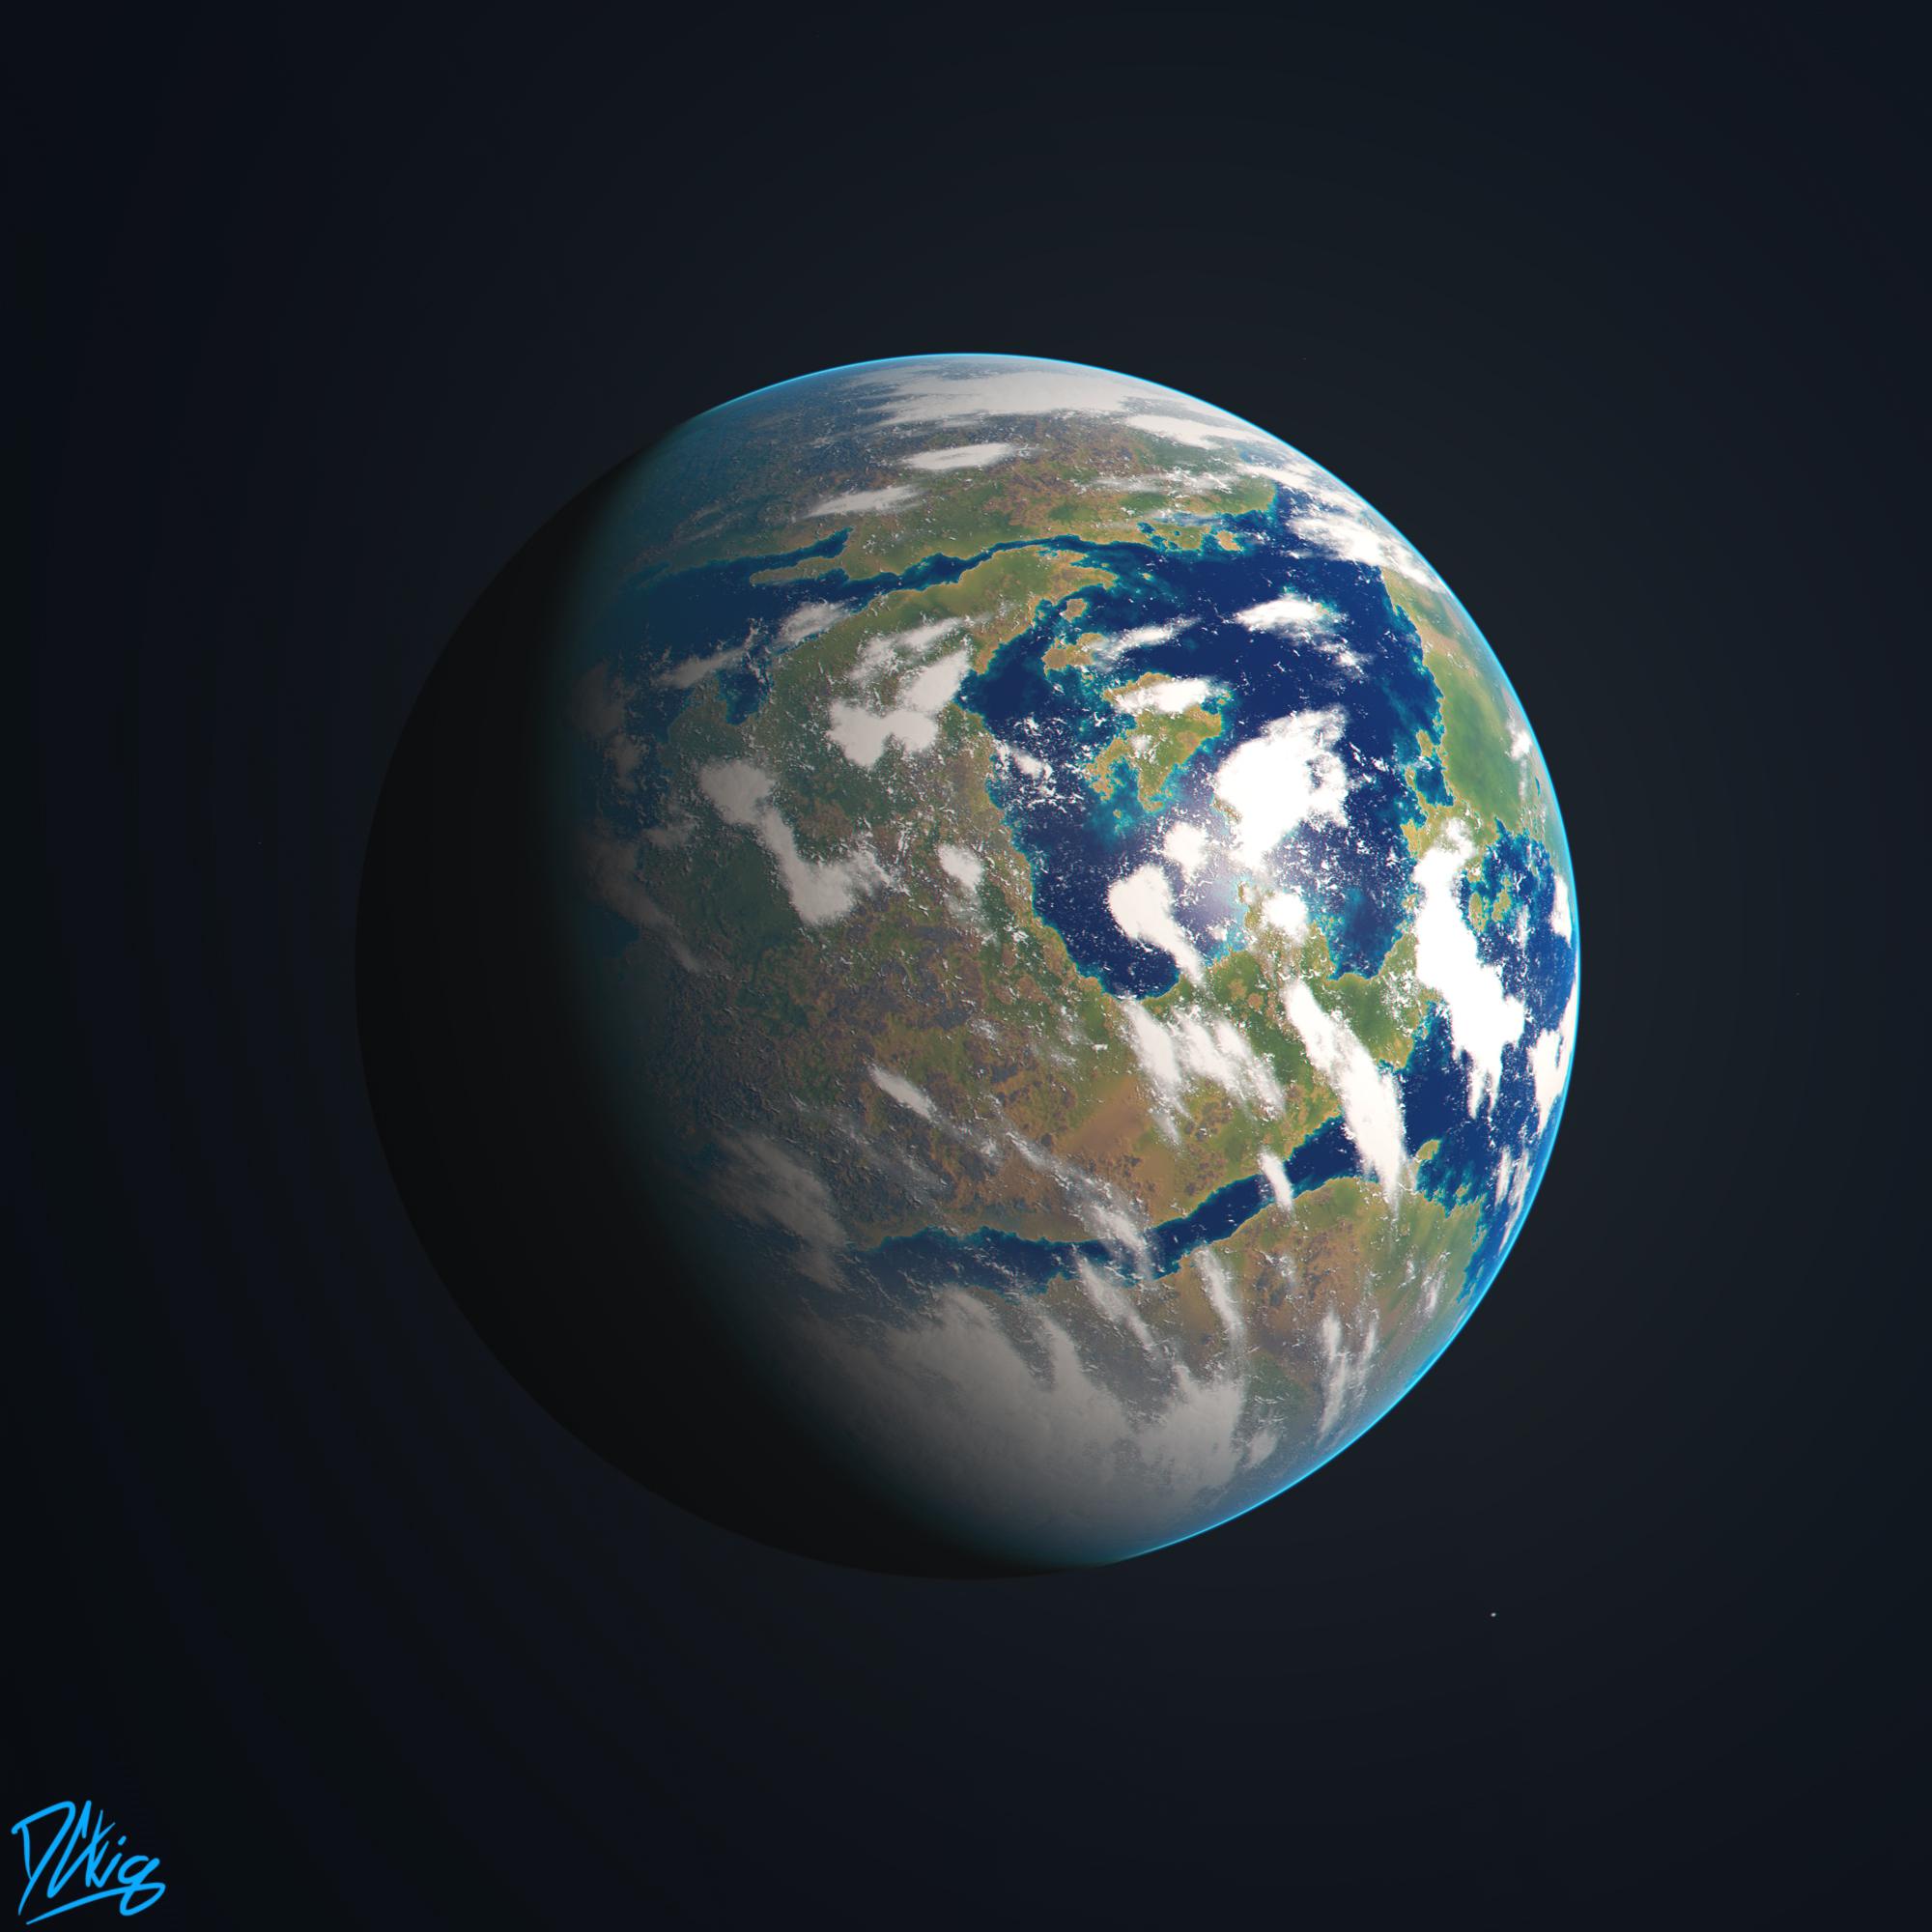 earth like world planet - photo #12